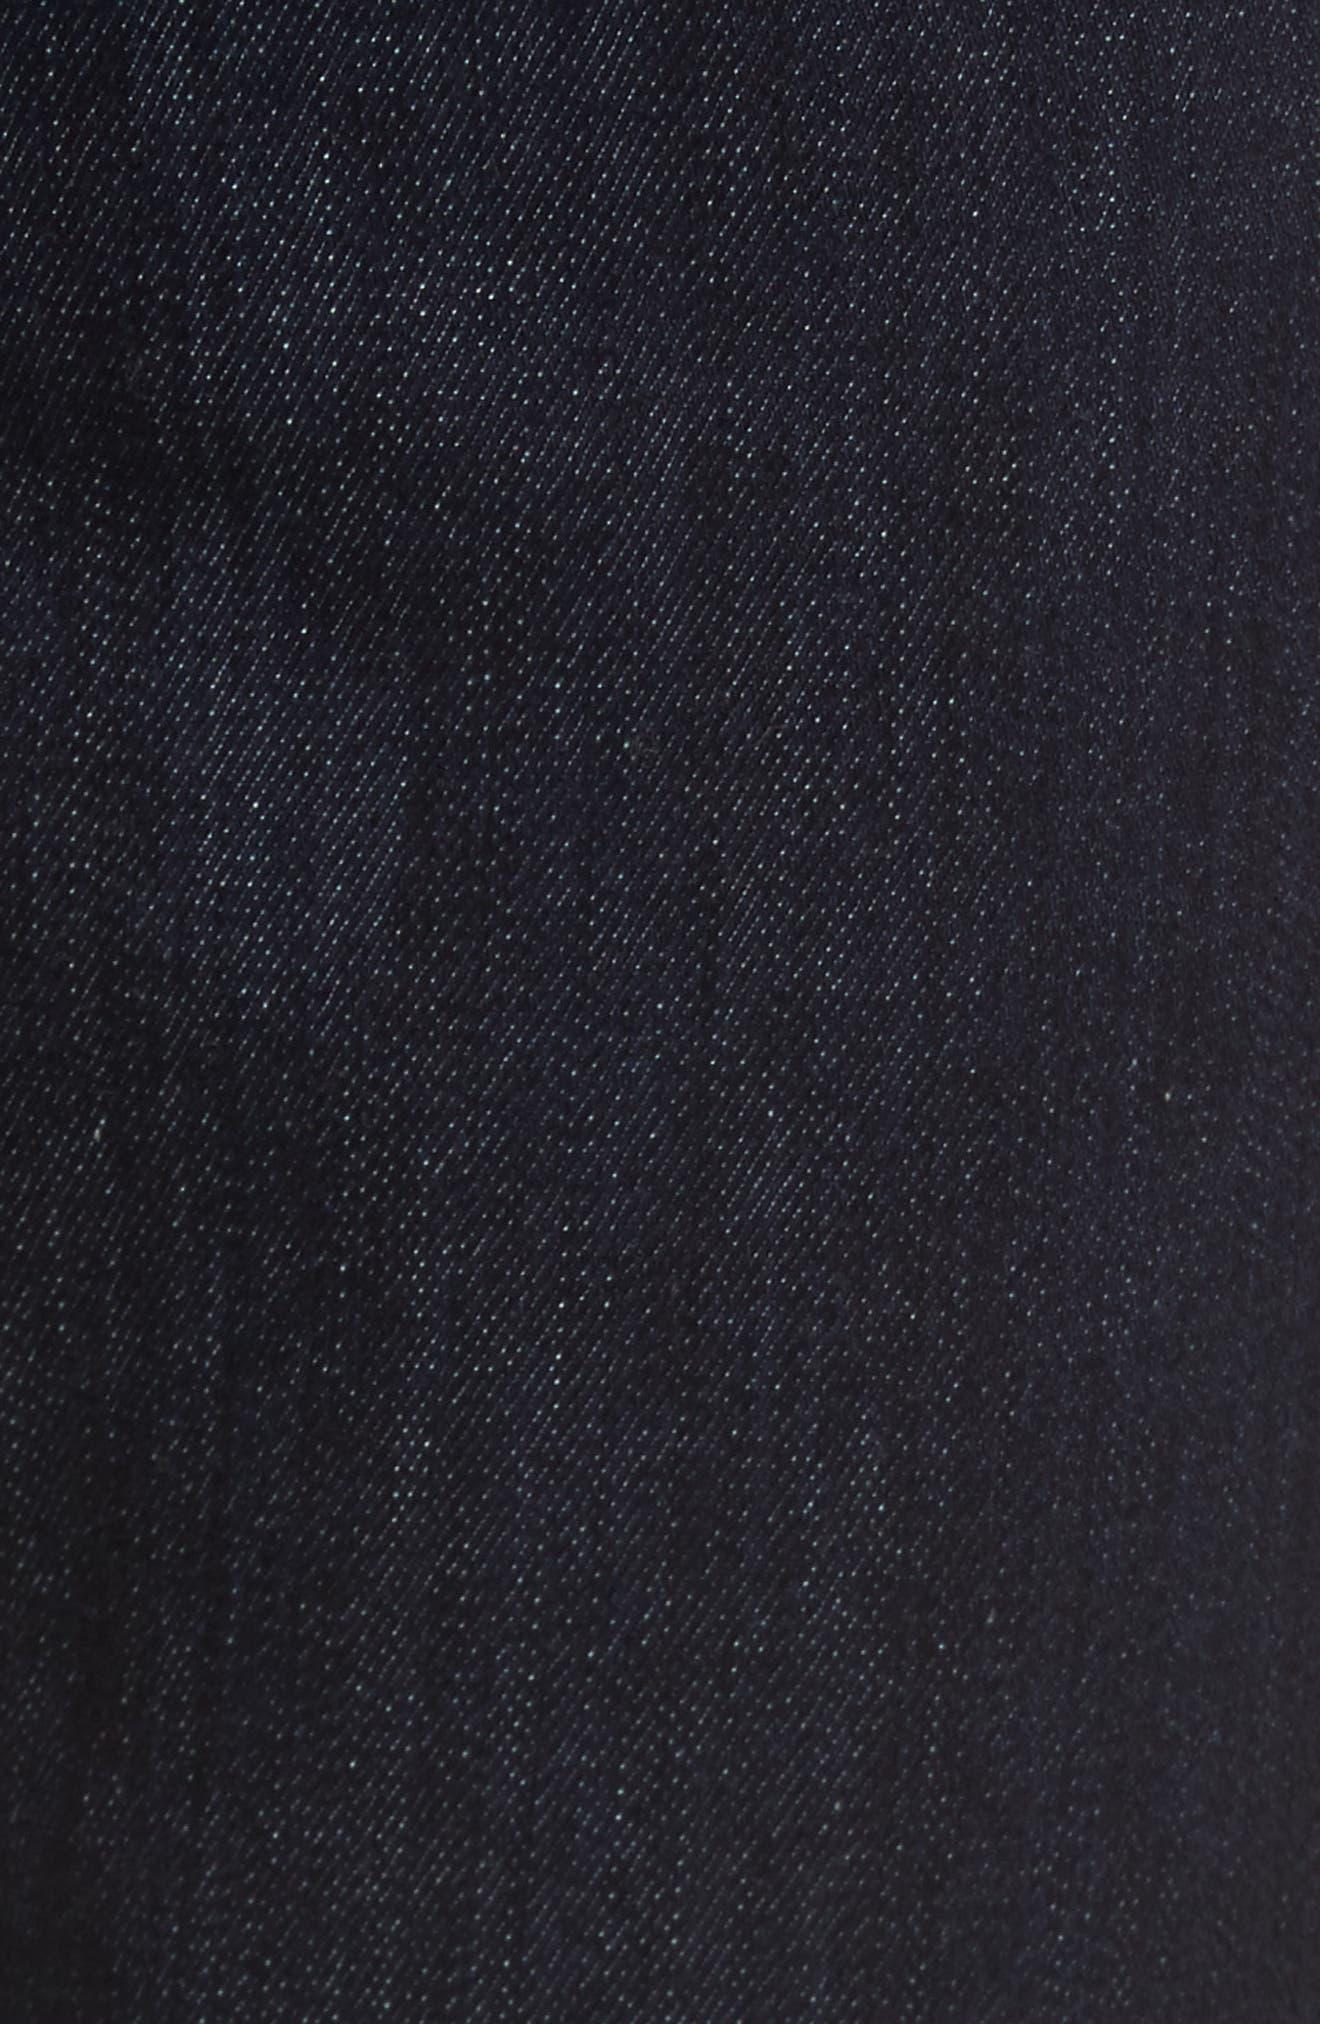 Vantage Skinny Fit Jeans,                             Alternate thumbnail 5, color,